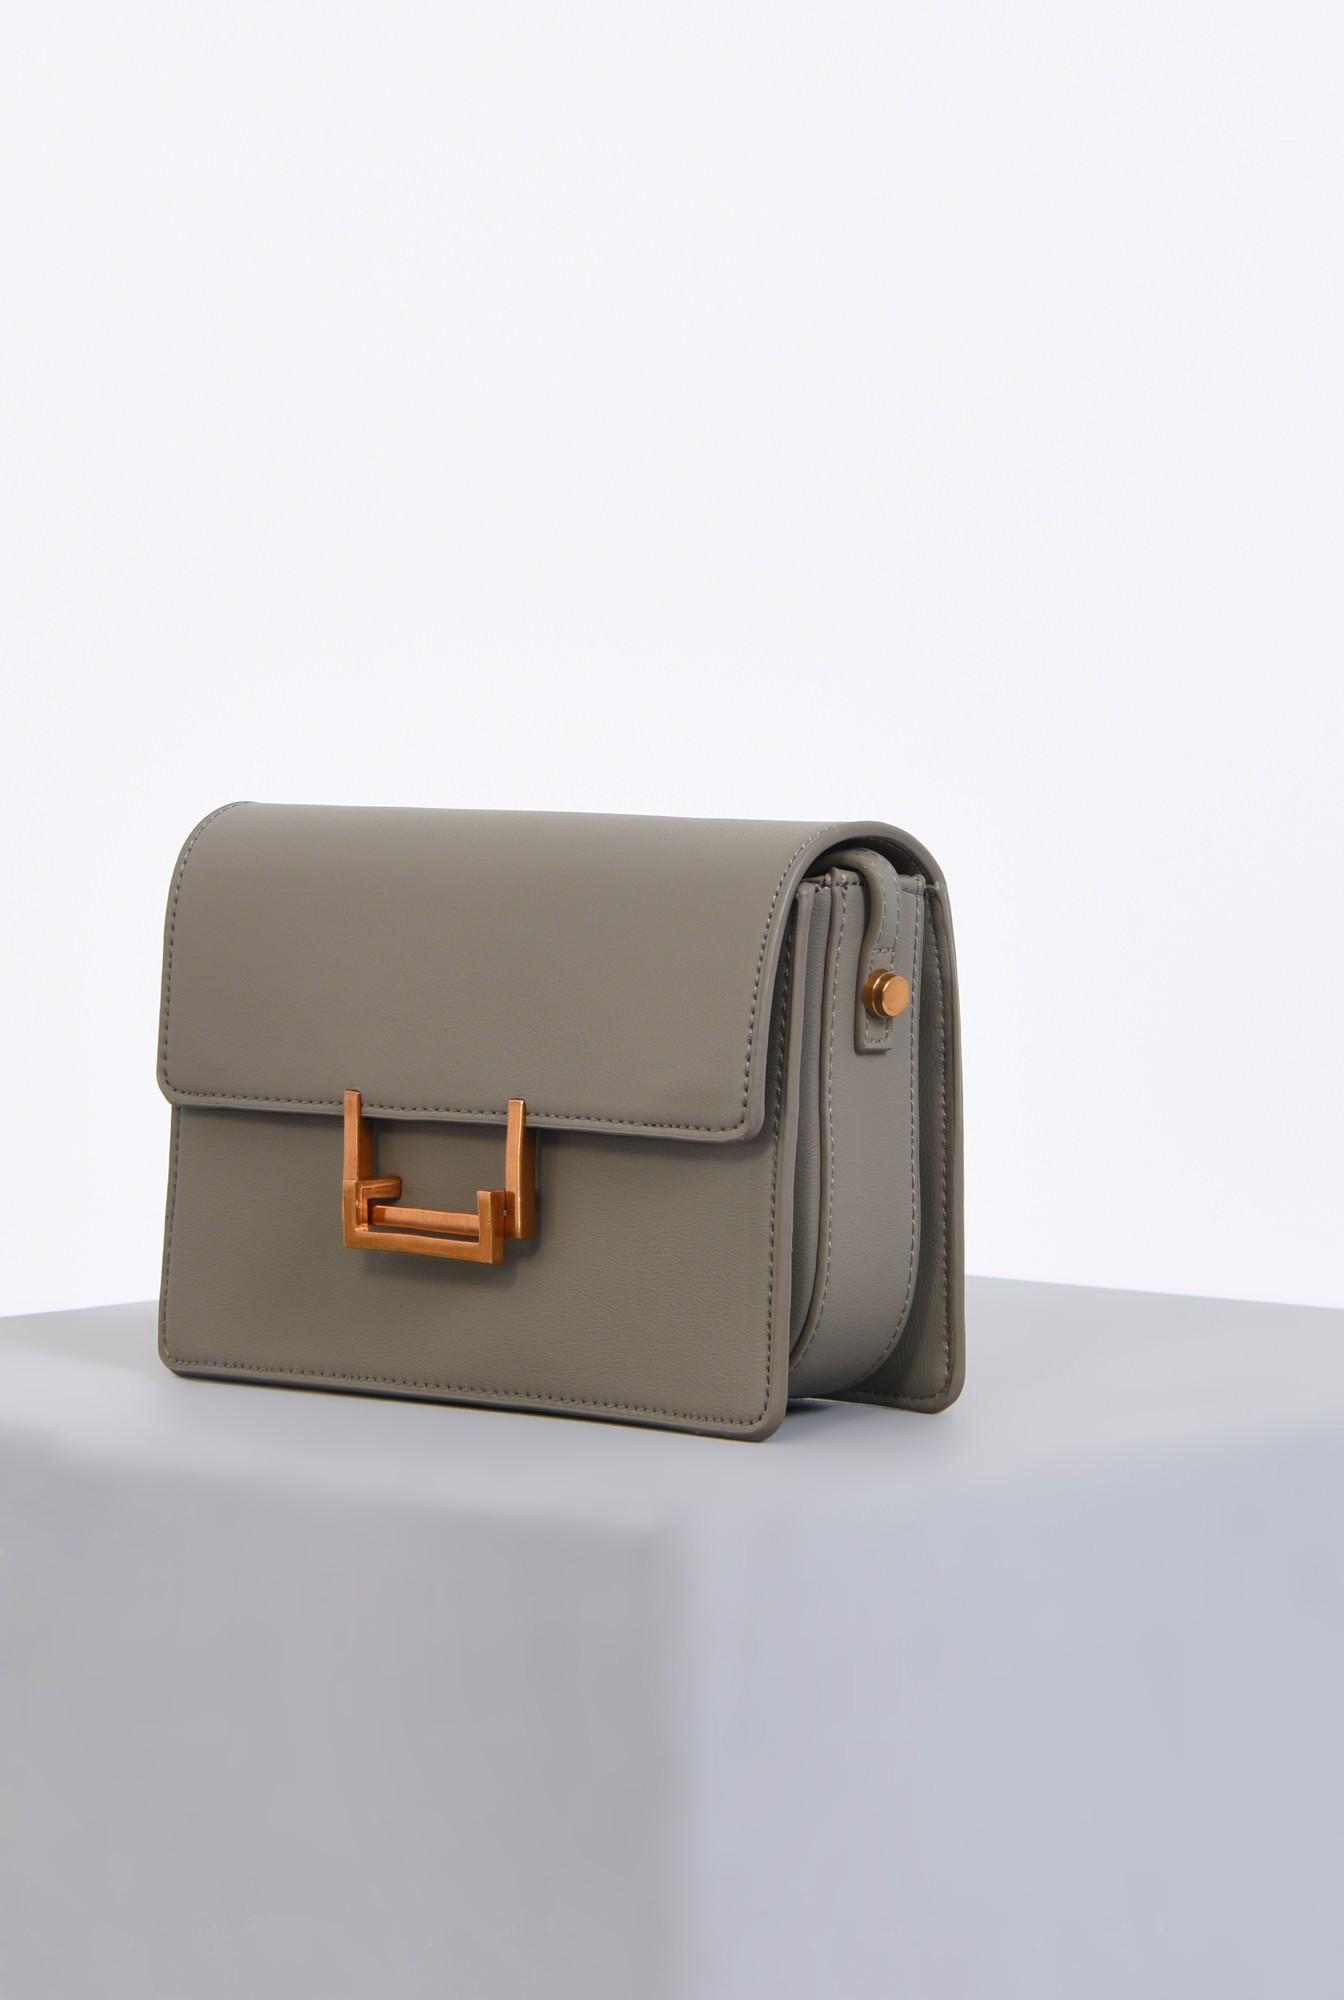 1 - geanta medie, accesorii, gri, poseta casual